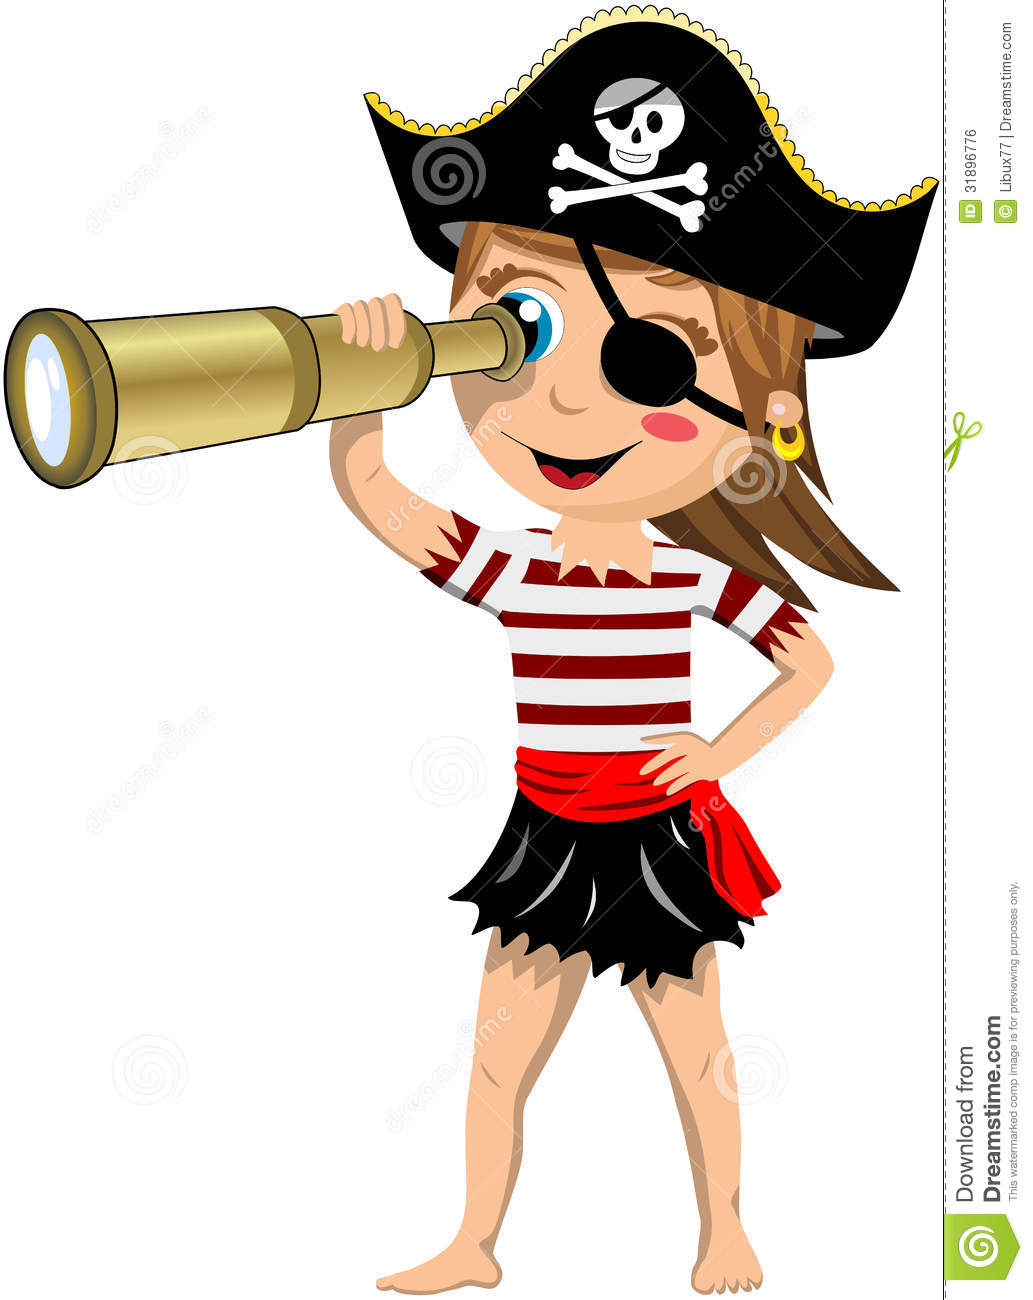 1033x1300 Top 97 Pirates Of The Caribbean Clip Art